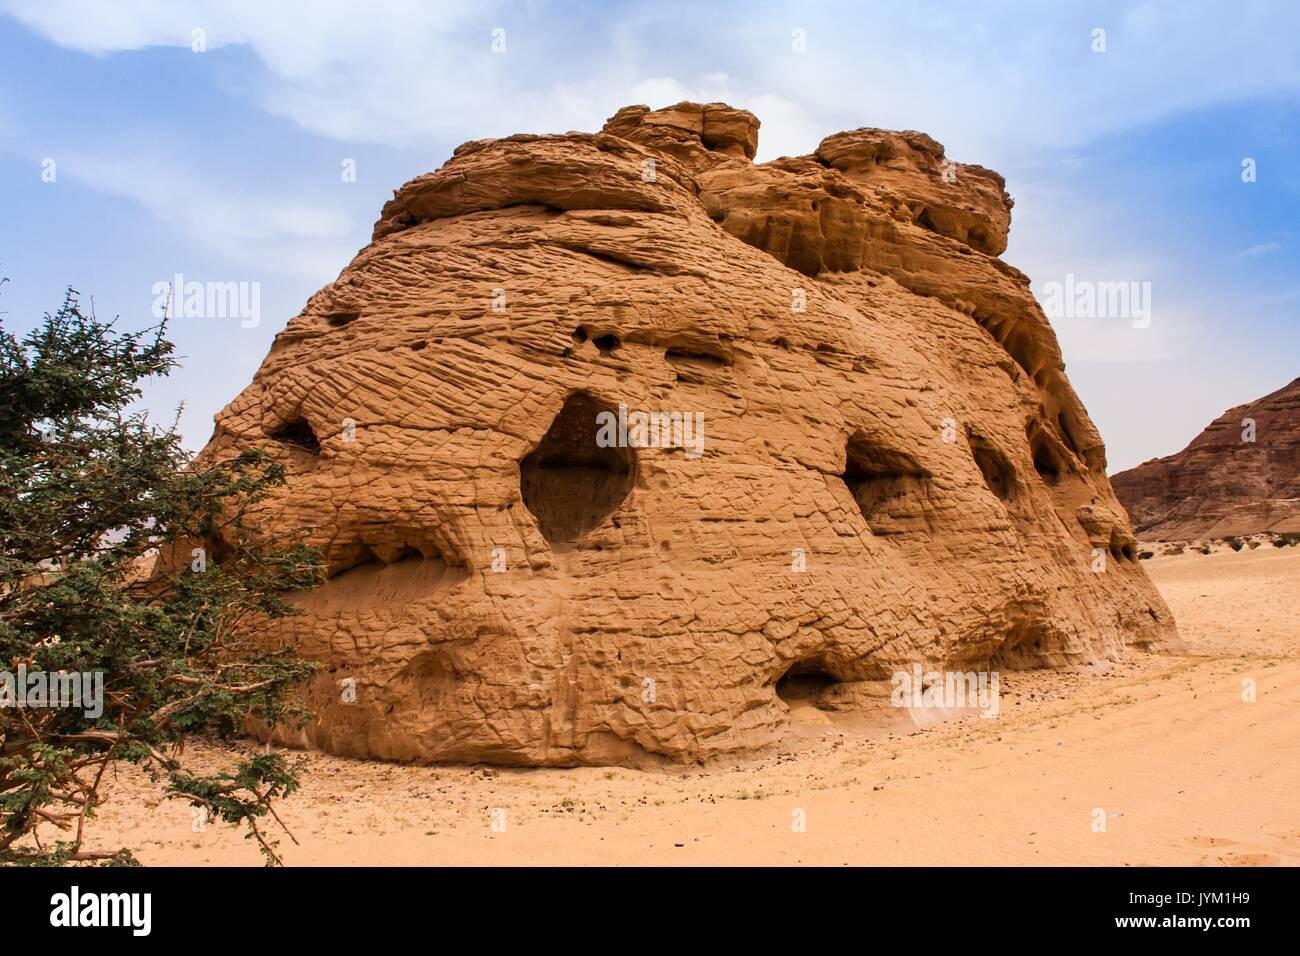 La pierre de la cathédrale, Riyadh Province Photo Stock